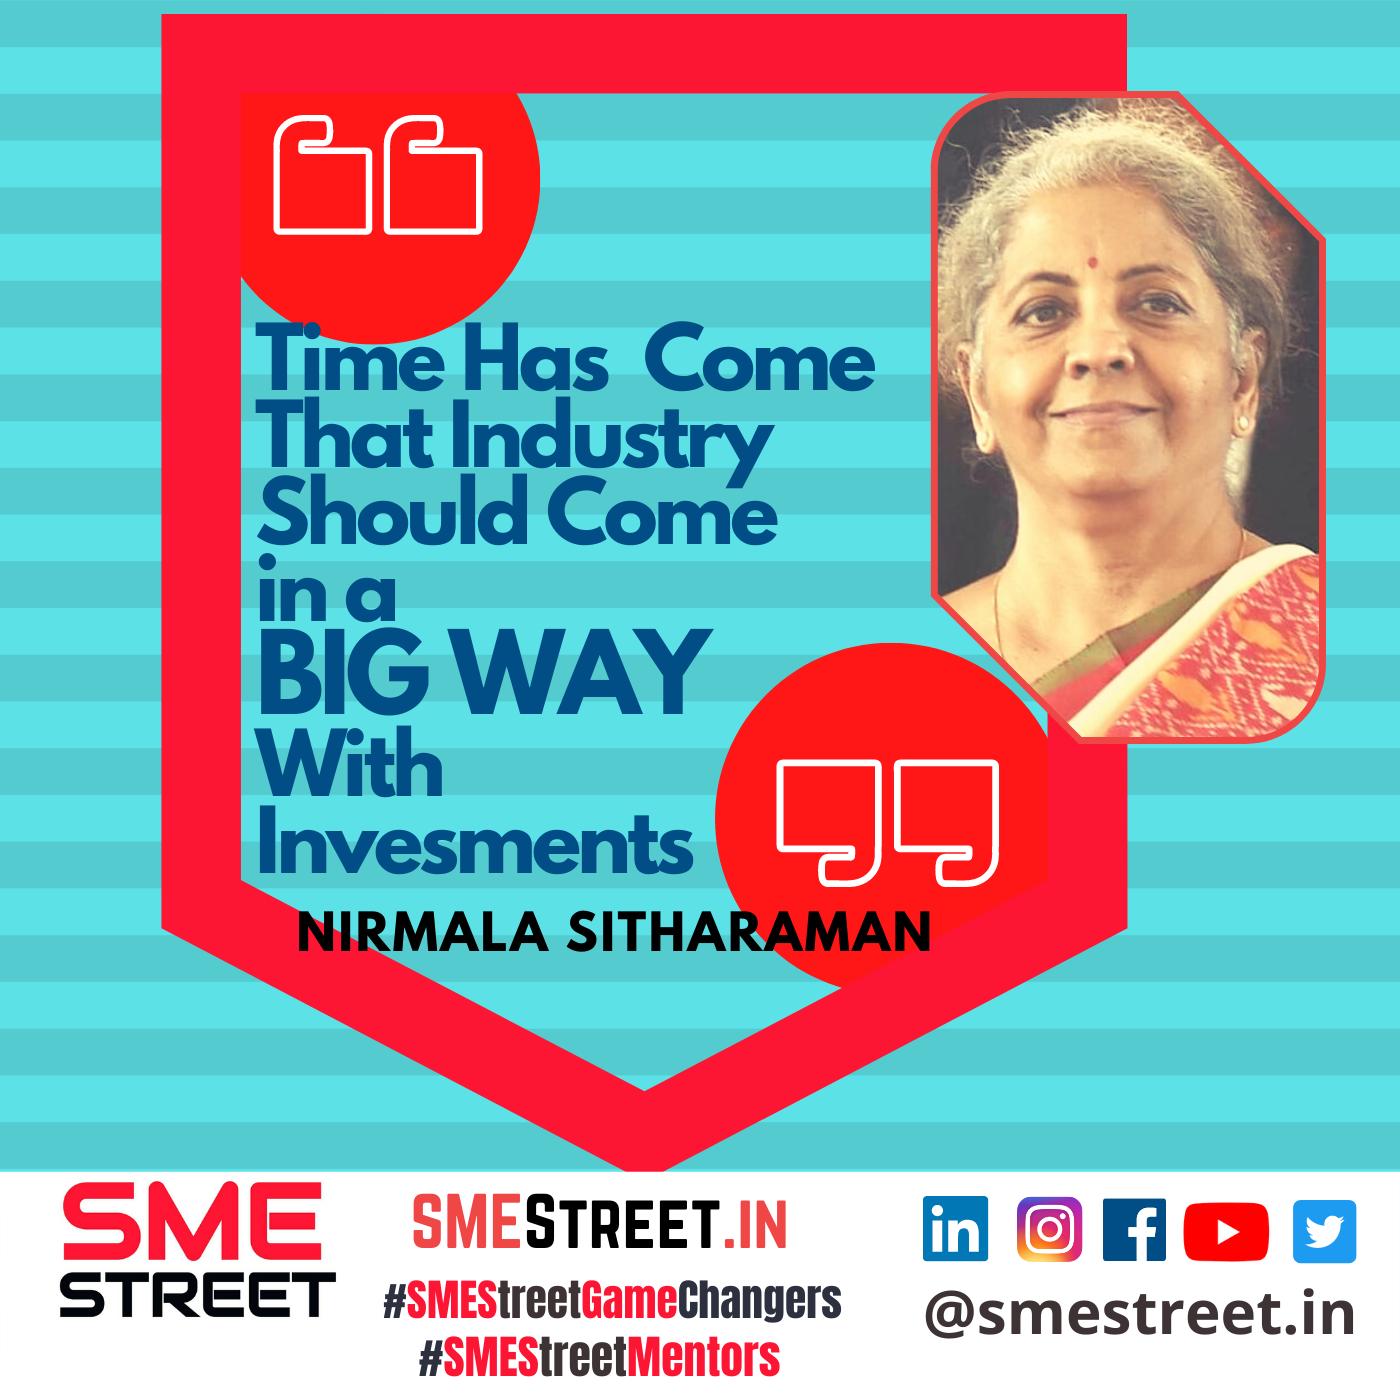 Nirmala Sitharaman, SMEStreet, Investment, Post COVID